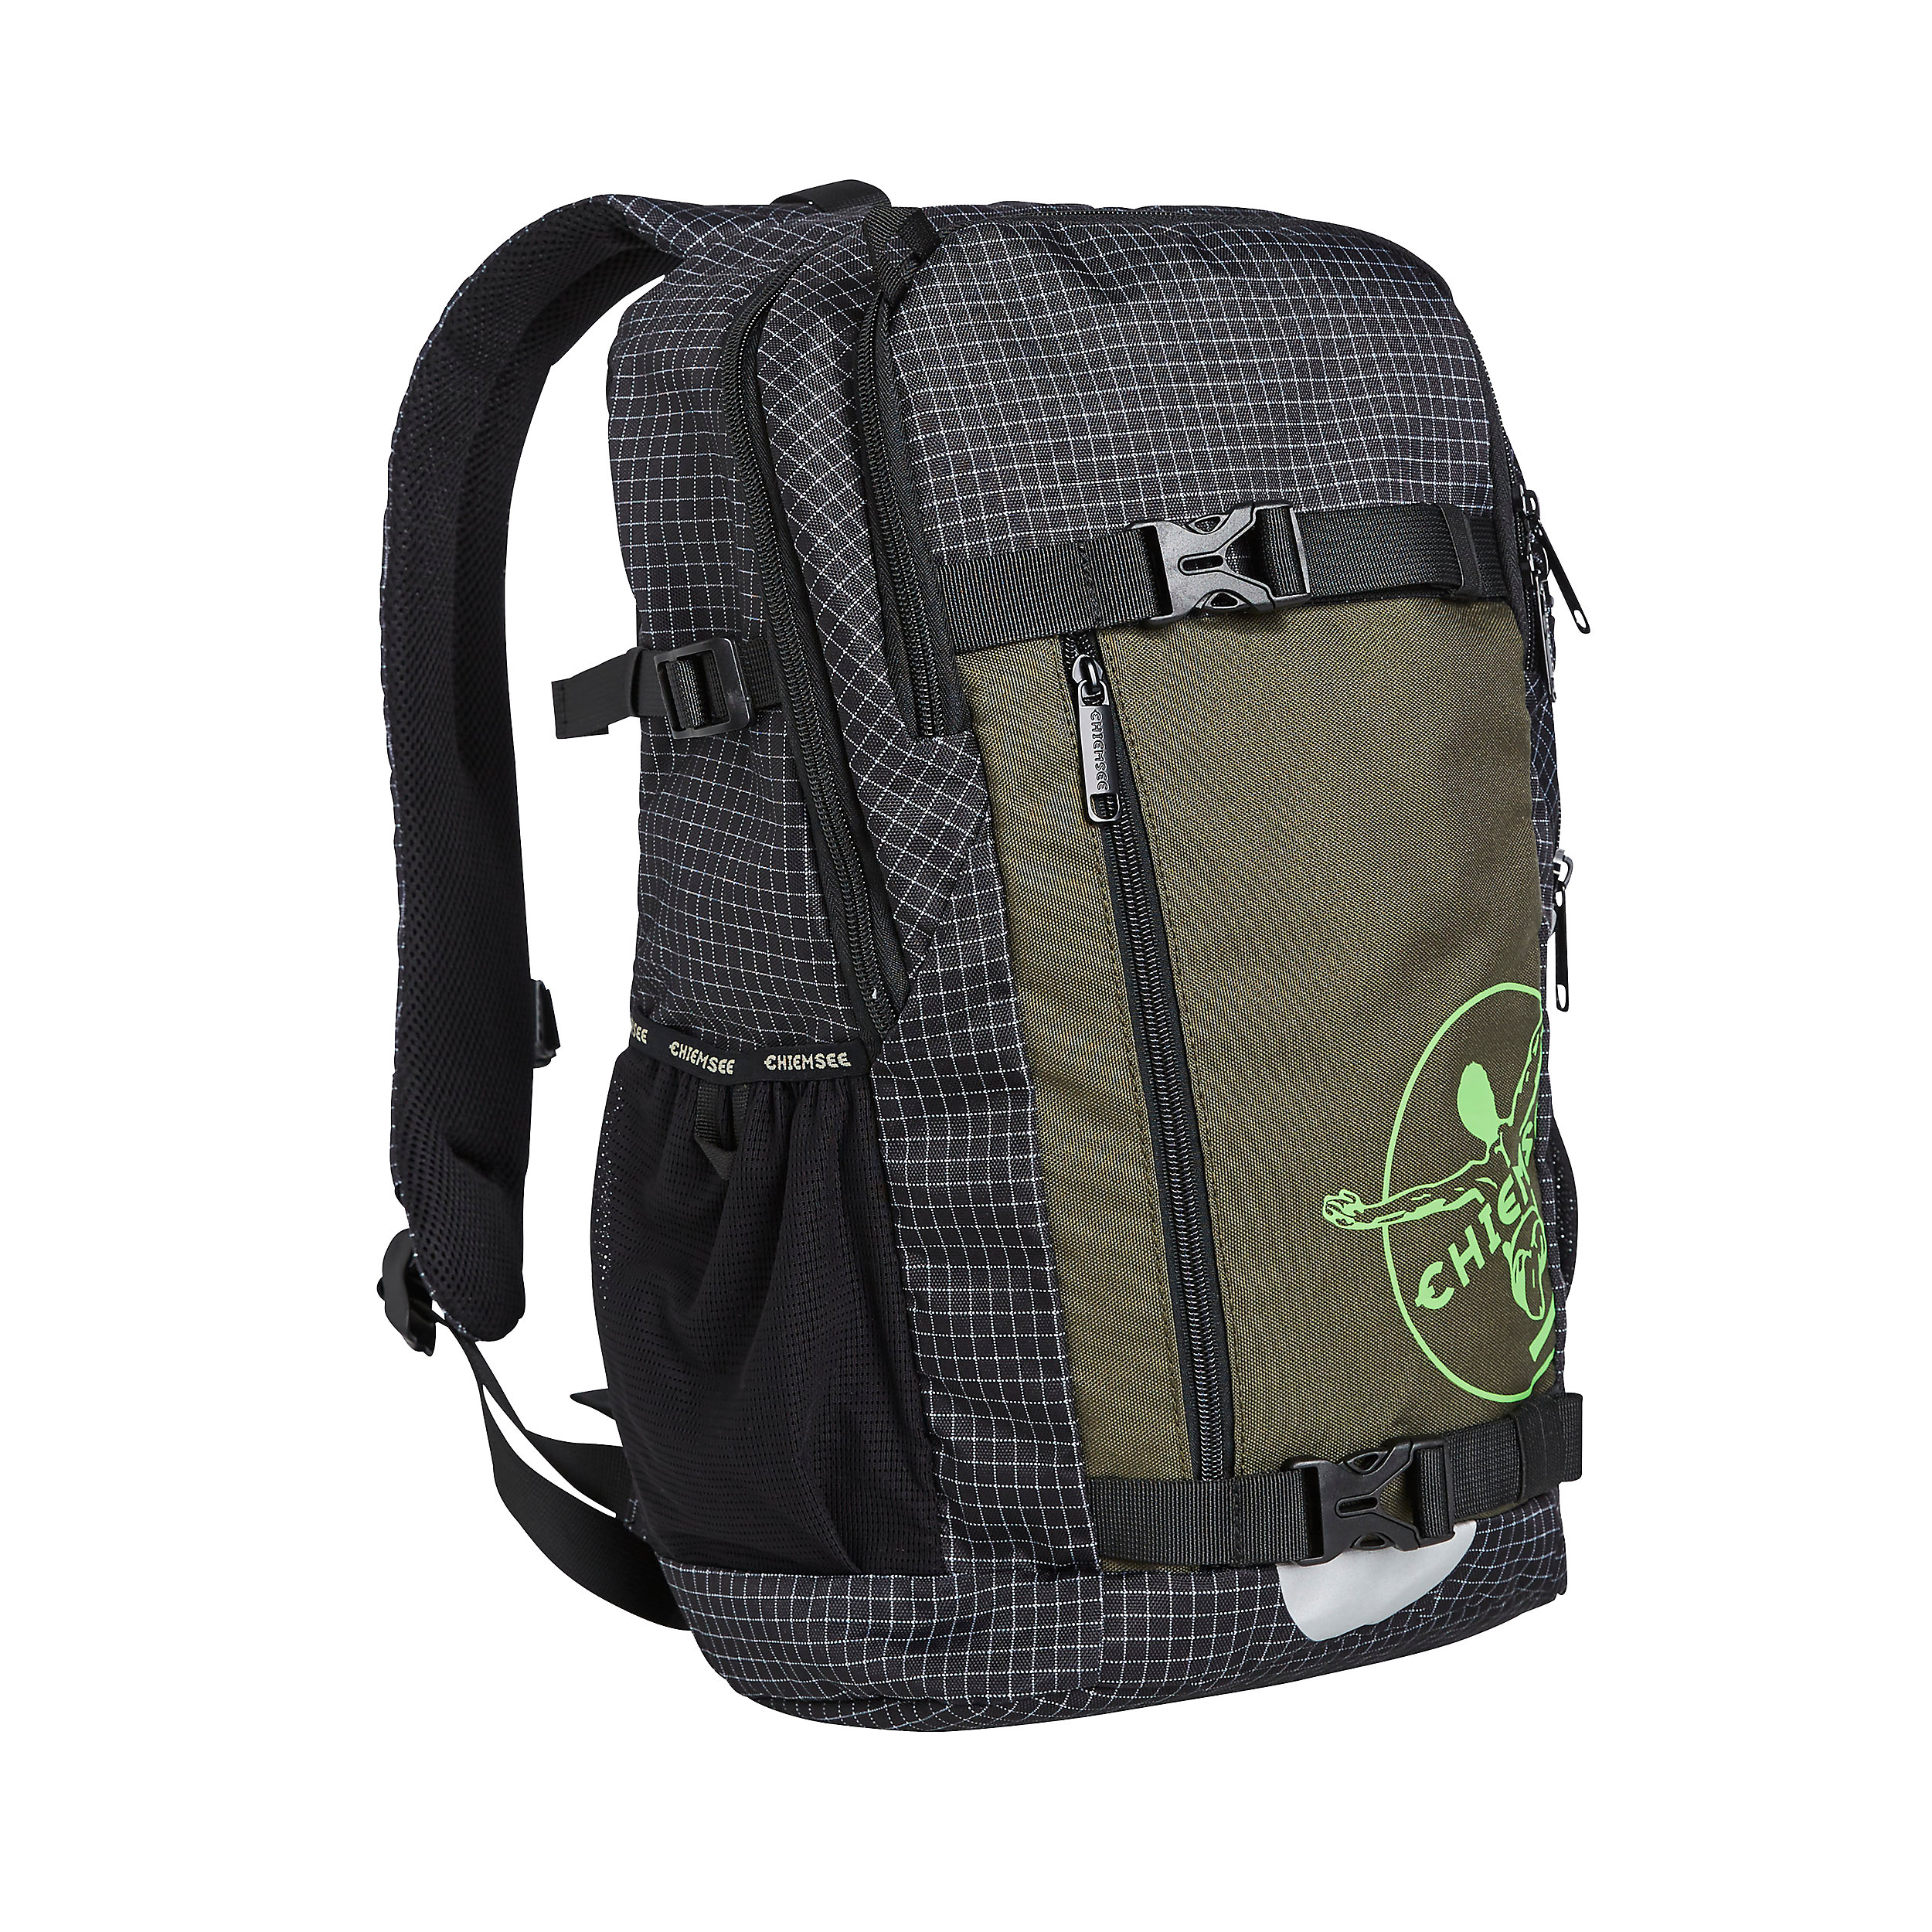 School Backpack 2-School M 22 Liter